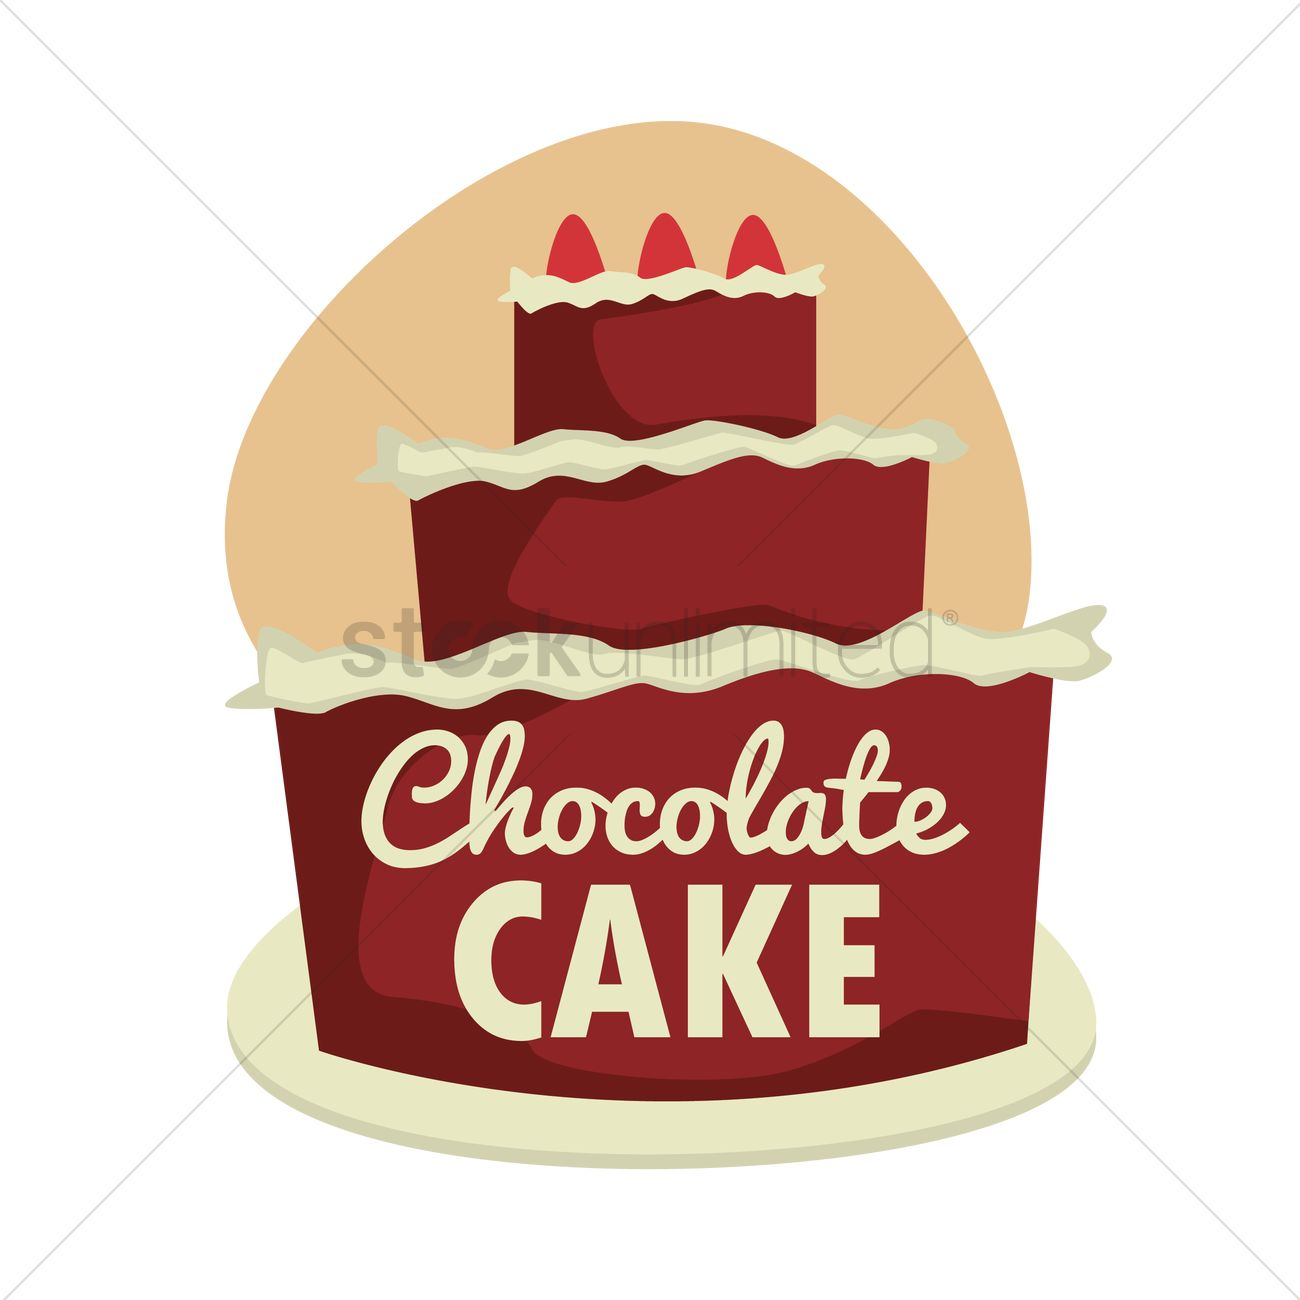 Chocolate Cake Menu Card Design Vector Image 1798681 Stockunlimited